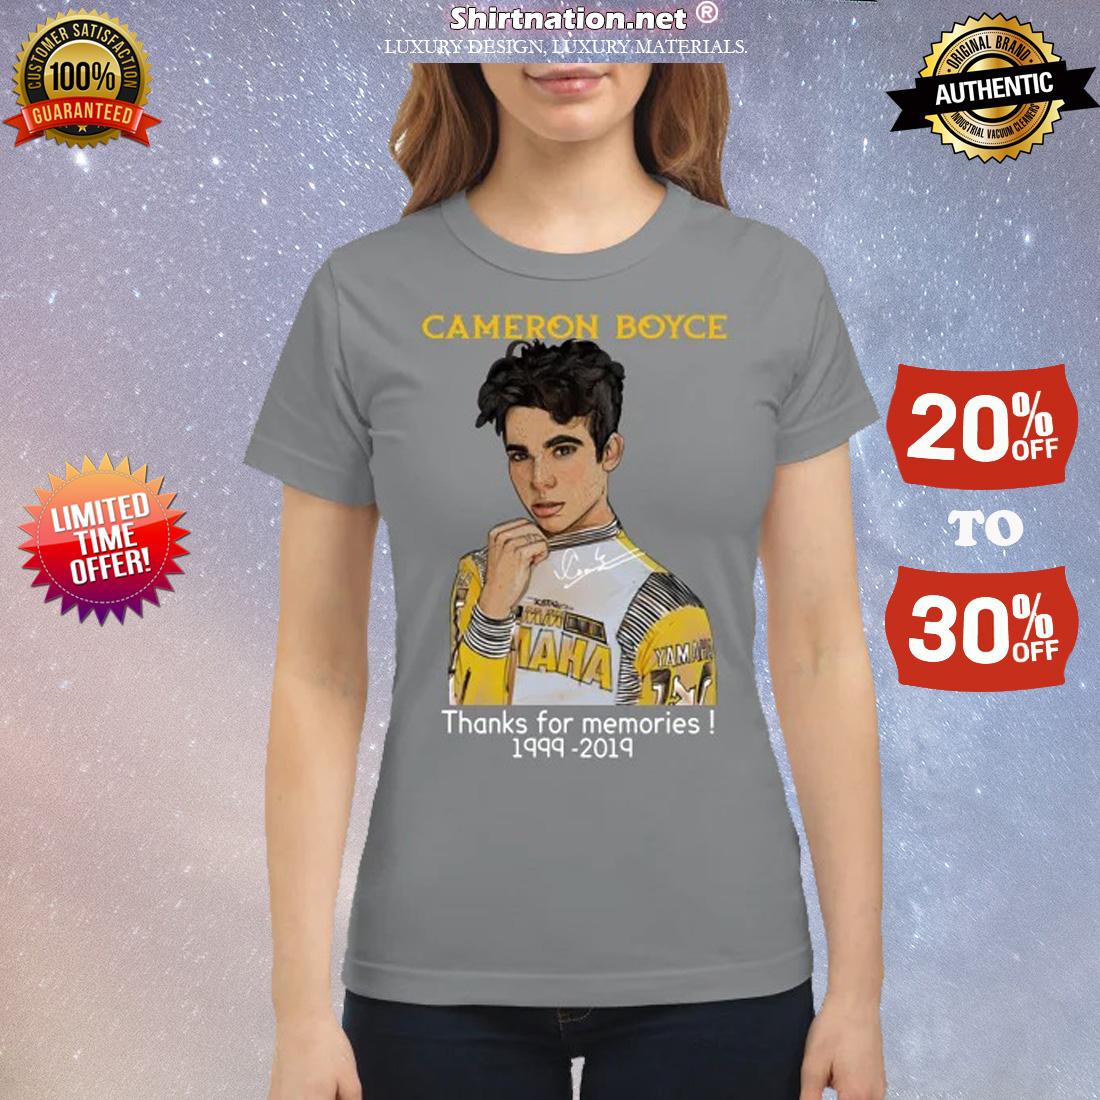 Cameron Boyce thanks for memories 1999 2019 classic shirt